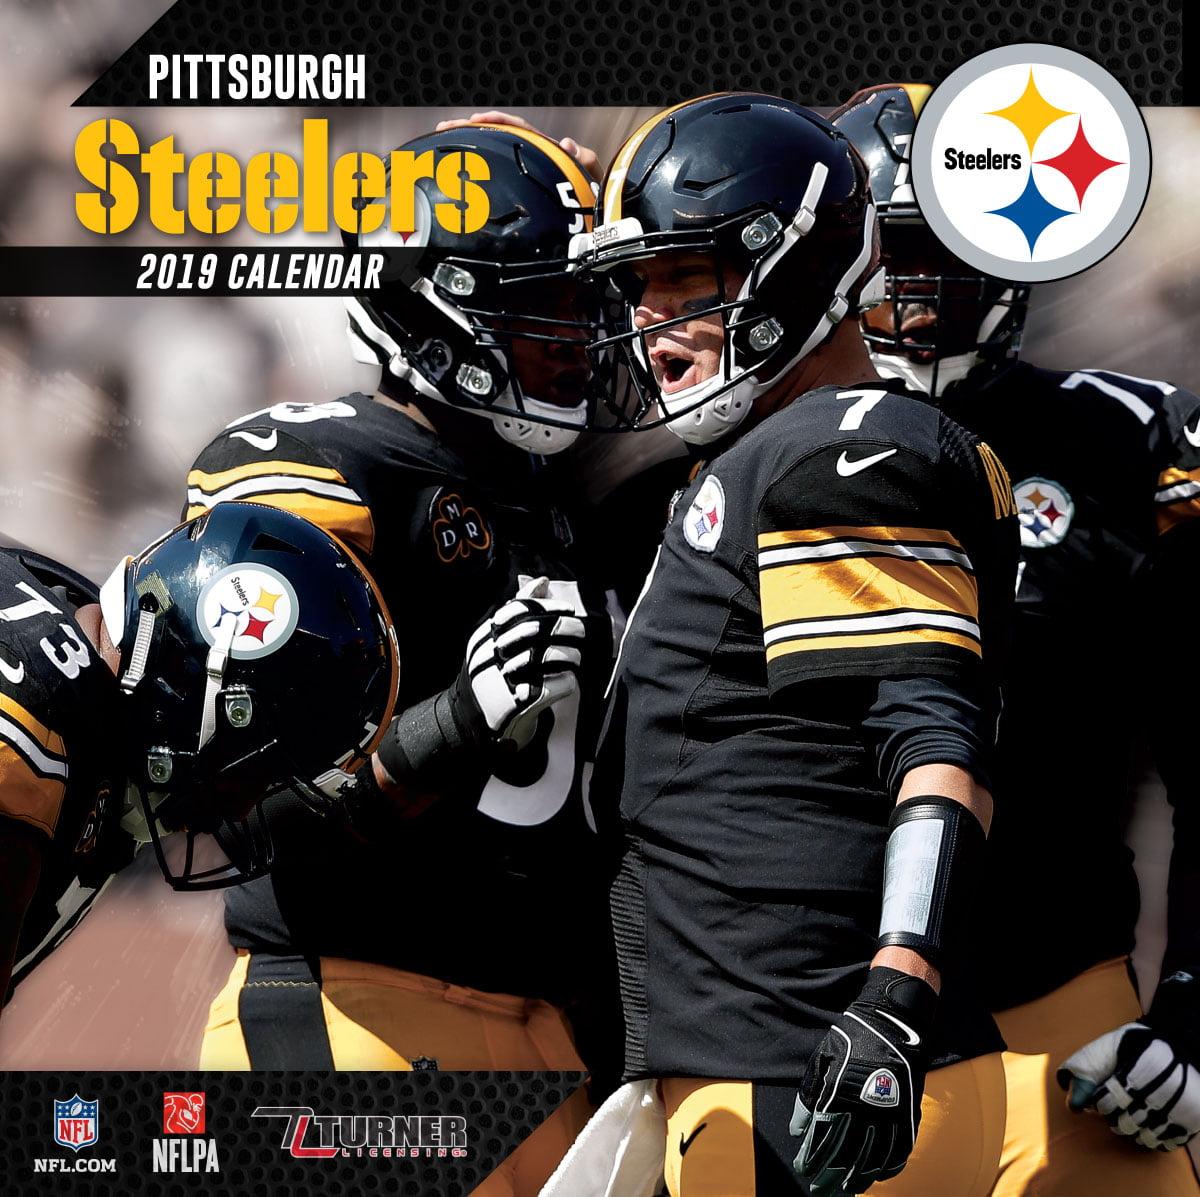 Steelers Calendar 2019 2019 12X12 TEAM WALL CALENDAR, PITTSBURGH STEELERS   Walmart.com